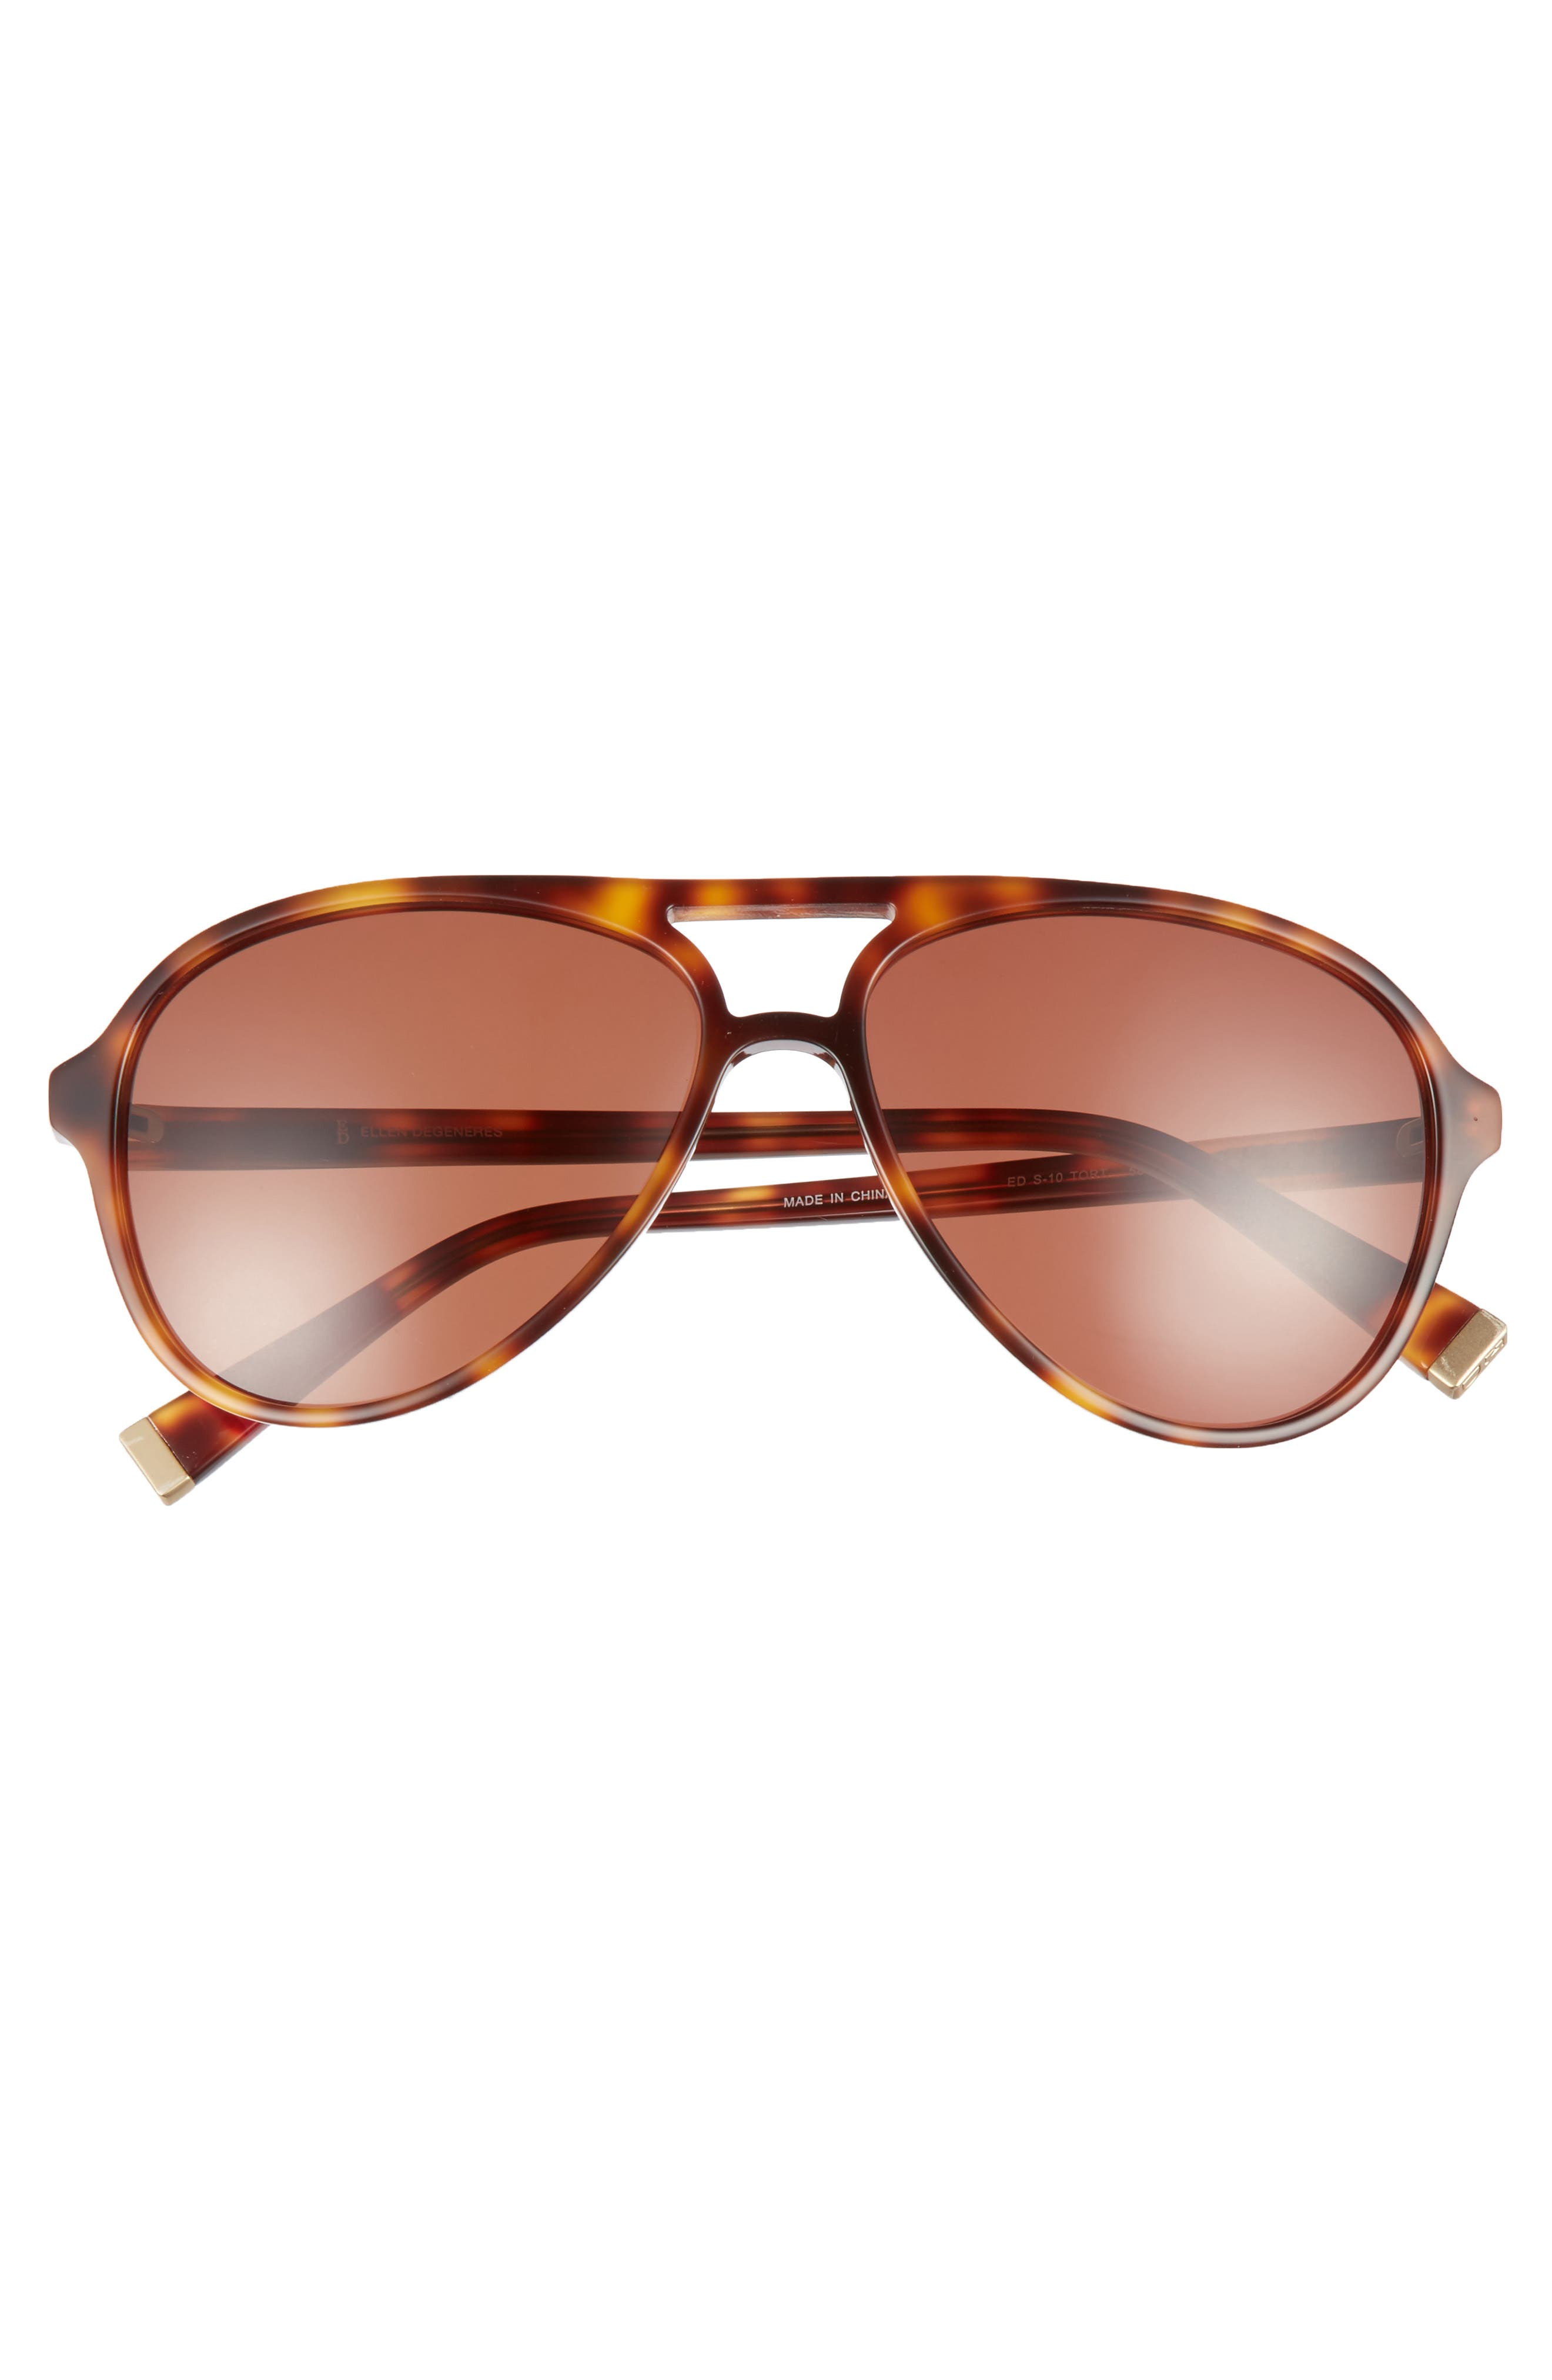 58mm Gradient Aviator Sunglasses,                             Alternate thumbnail 3, color,                             TORTOISE